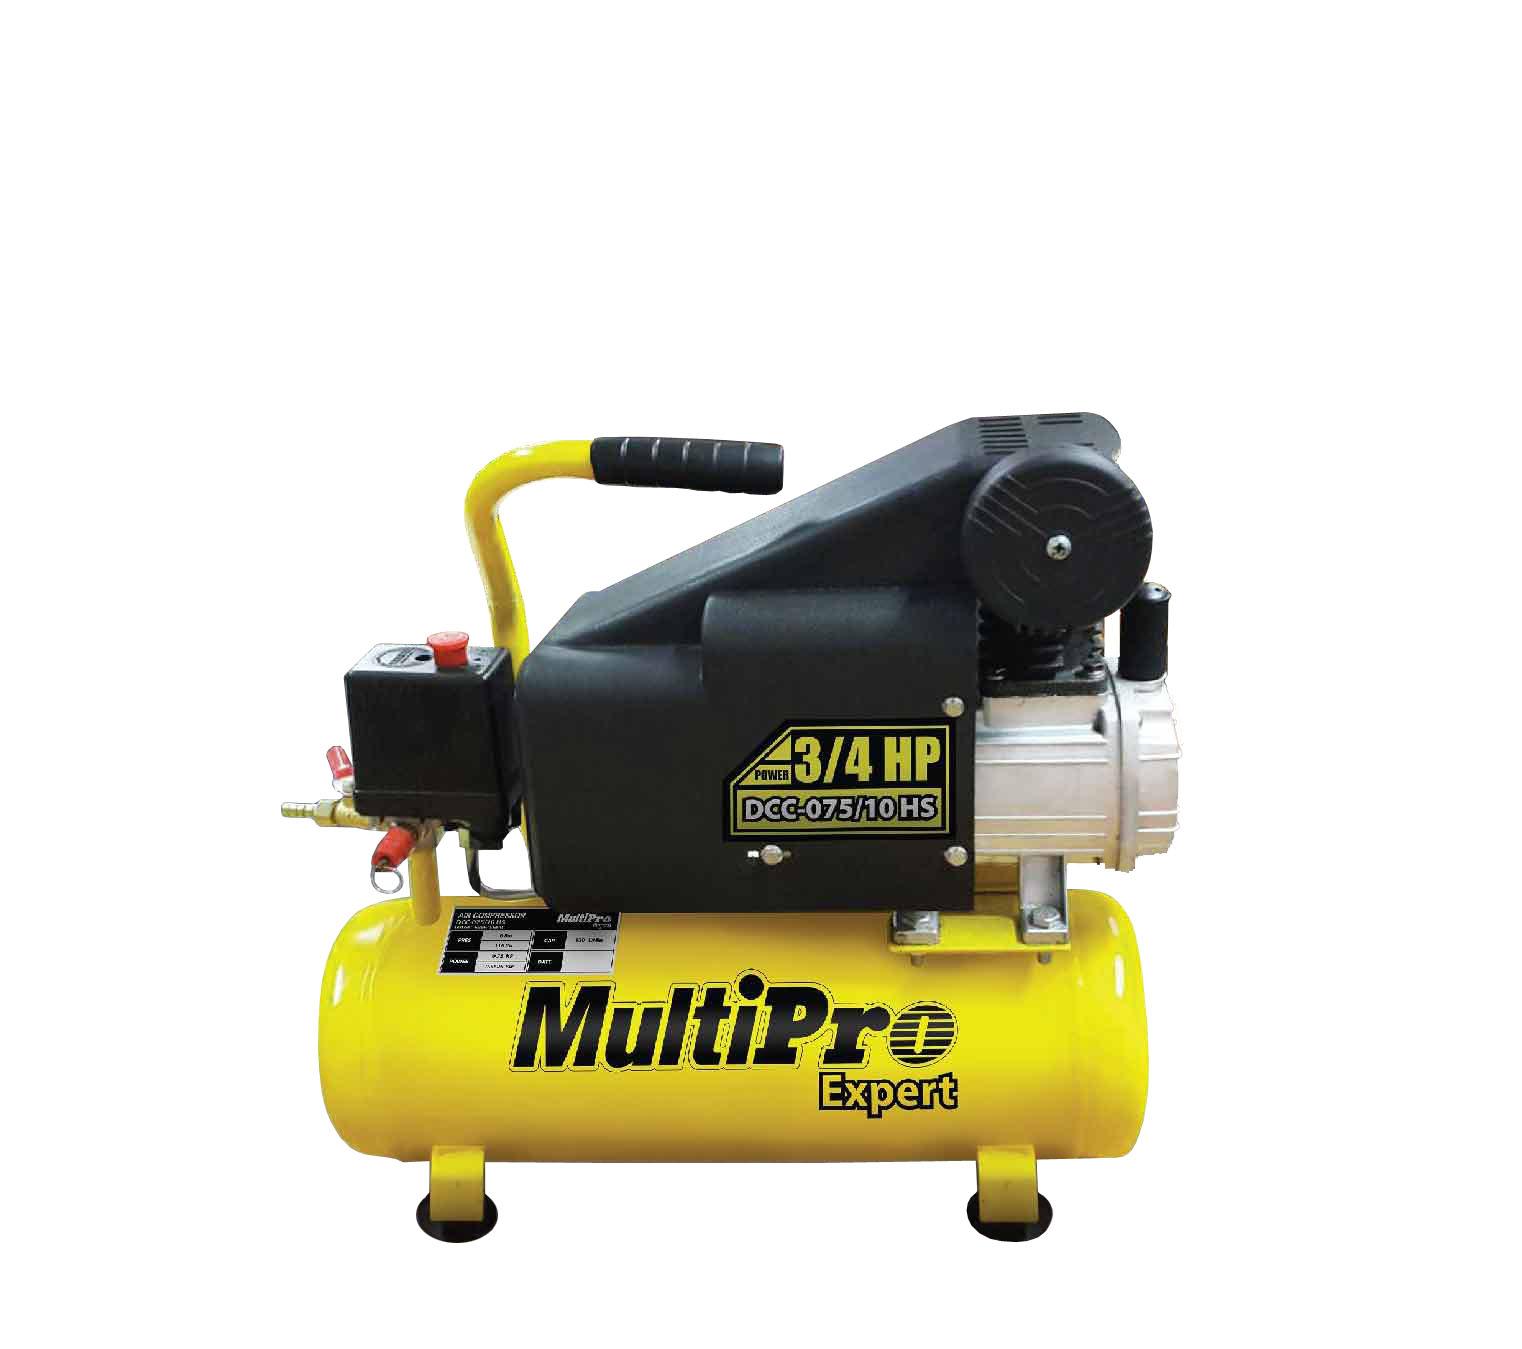 Multipro Kompresor Angin Listrik 34hp 10liter Dcc 07510hs Pengiriman Mini Air Compressor Mcv 102 Mpab Jual Expert 075 10 Hs Direct 3 4 Hp